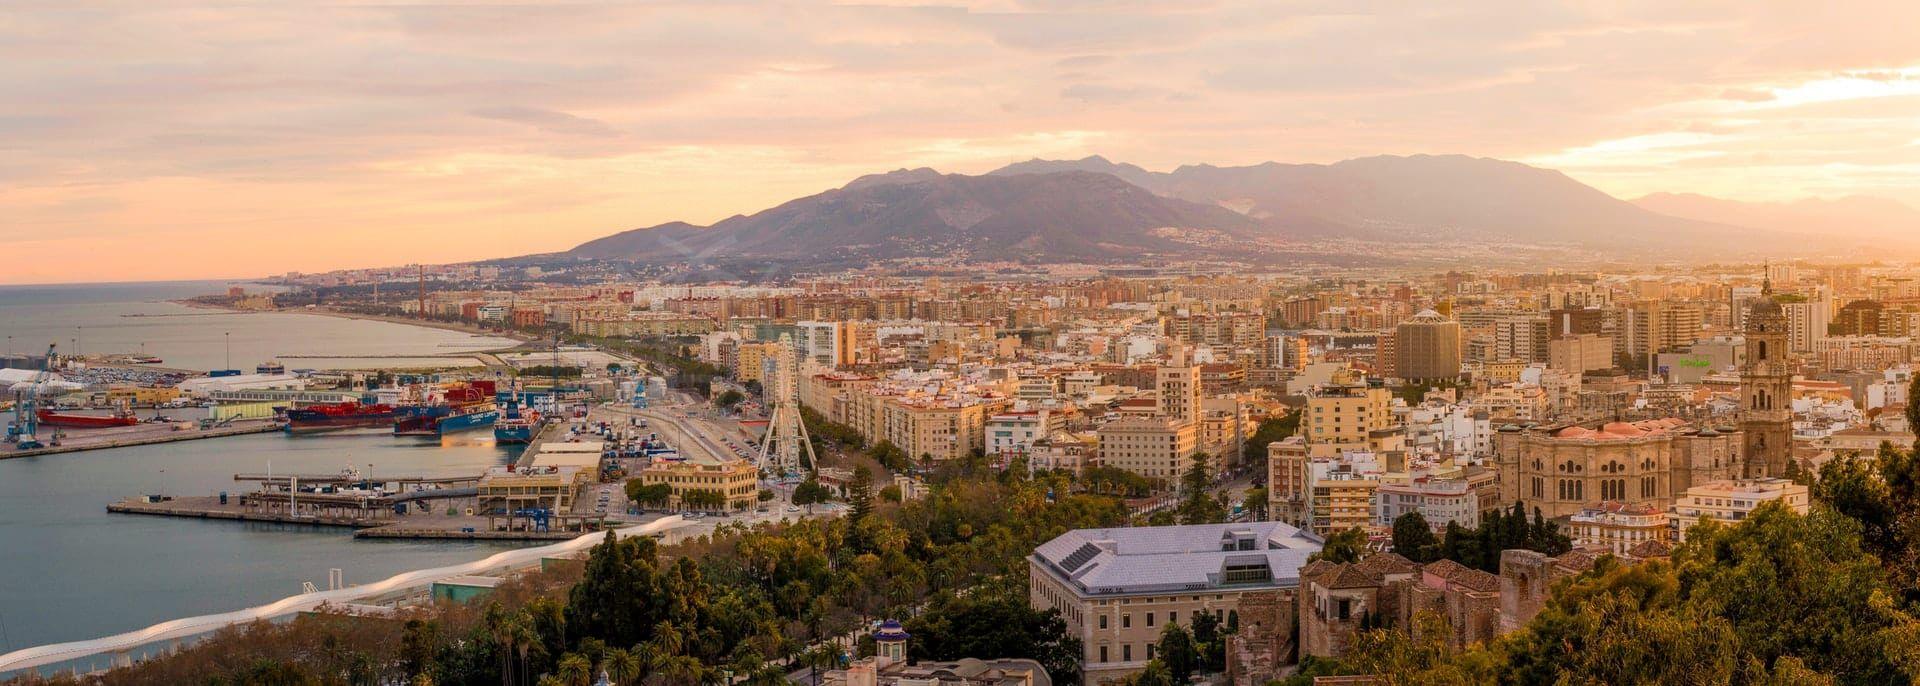 L'aéroport de Málaga prend son envol en 2019